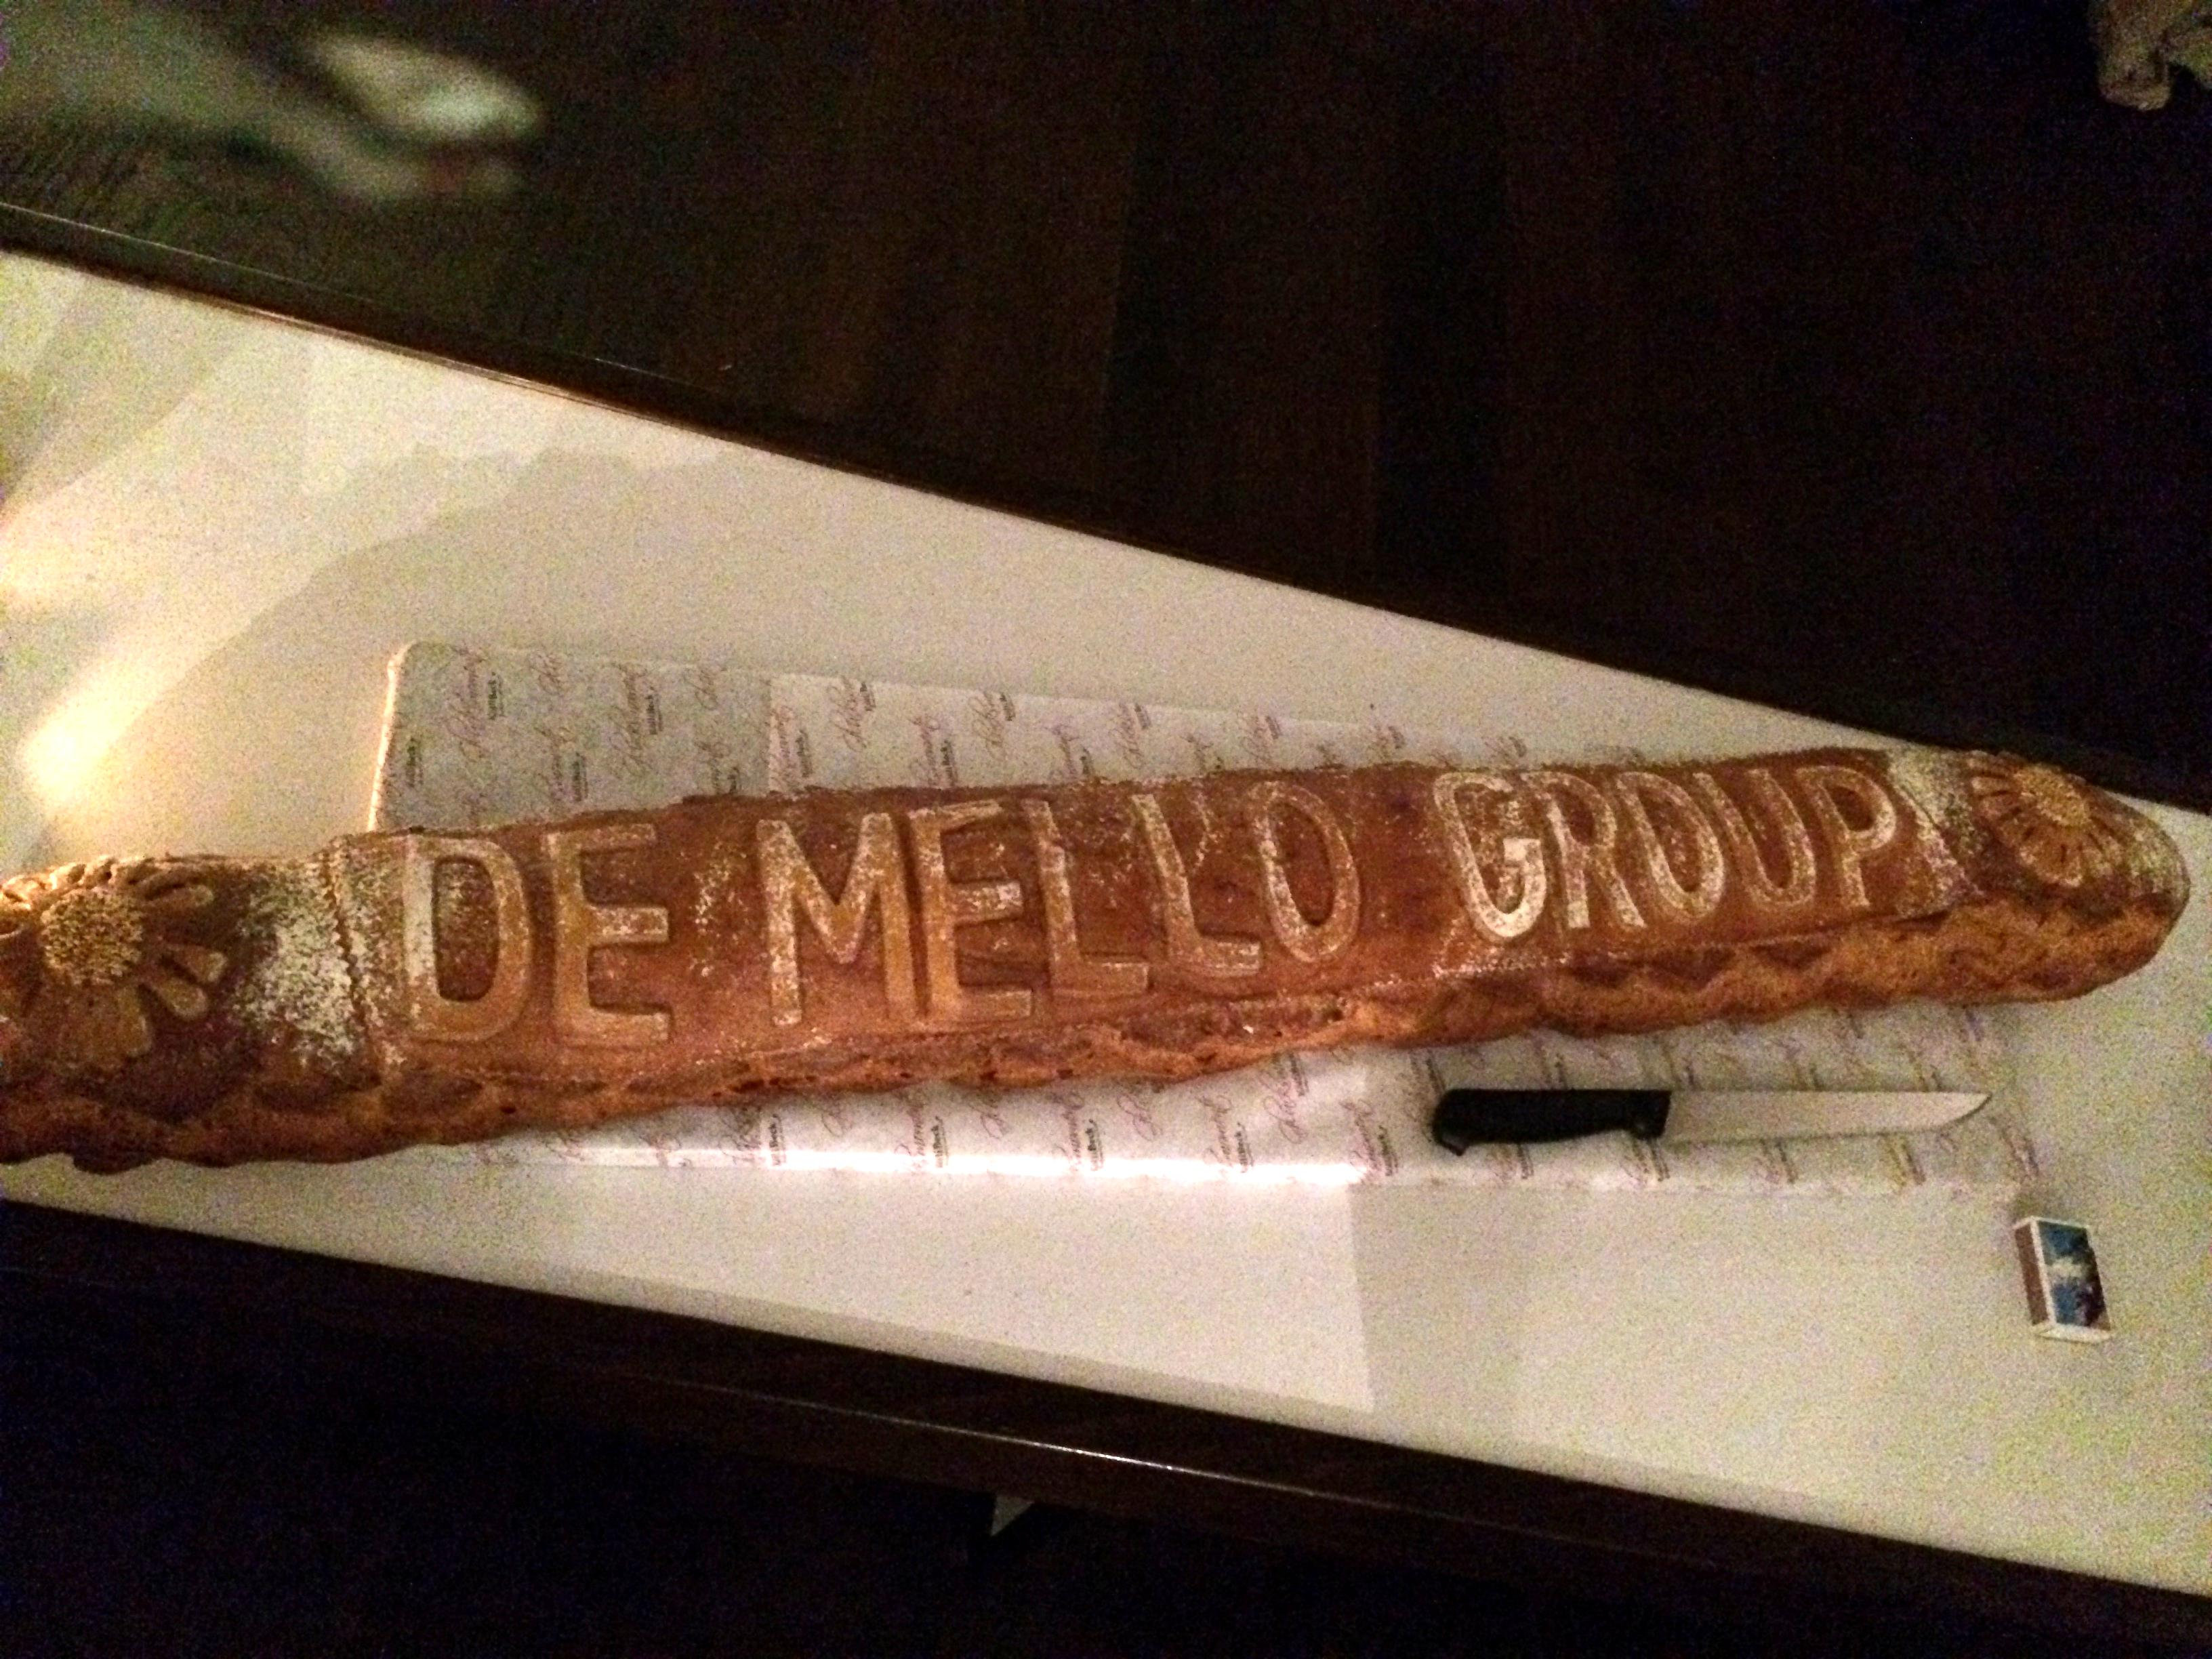 deMello Group Bread